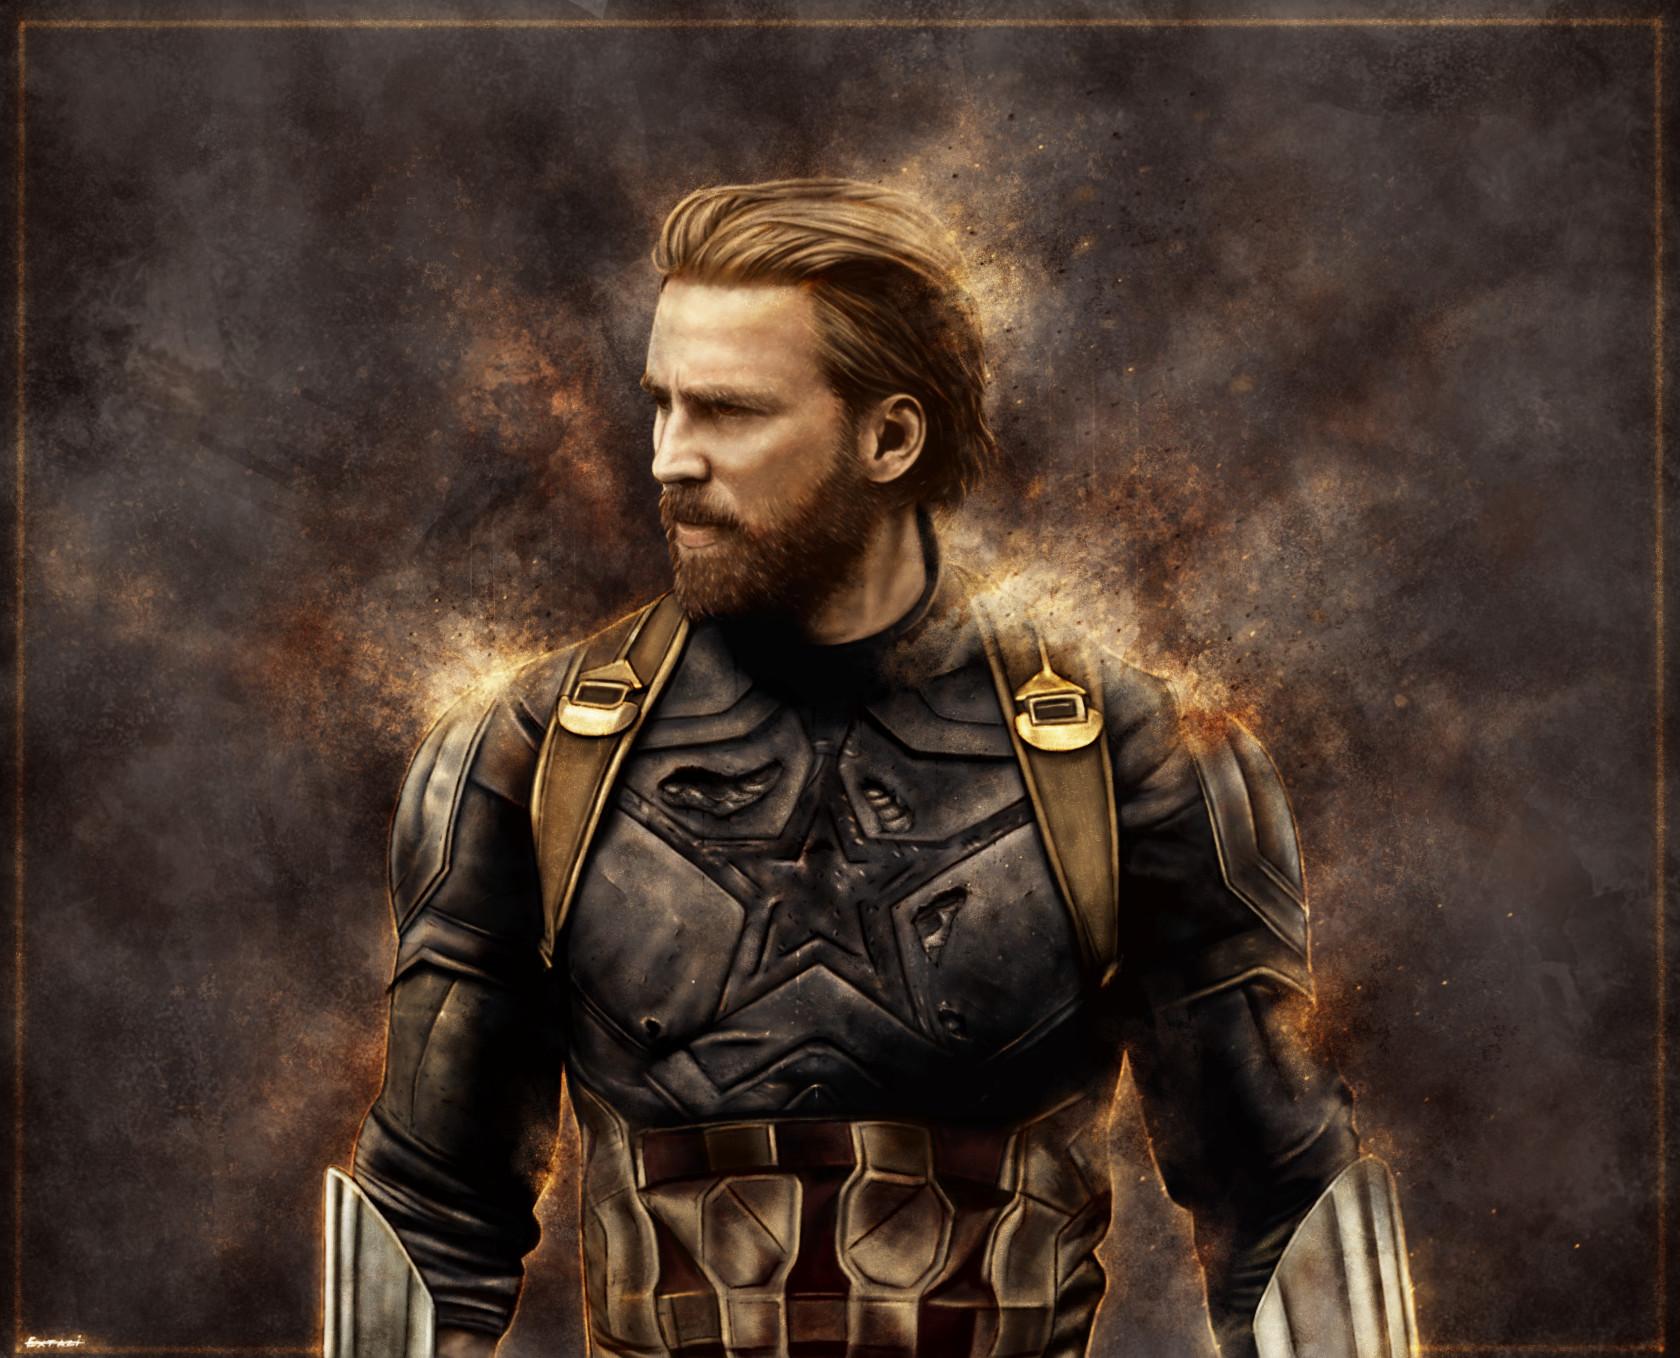 artstation - avengers: infinity war - captain america , andrey pankov